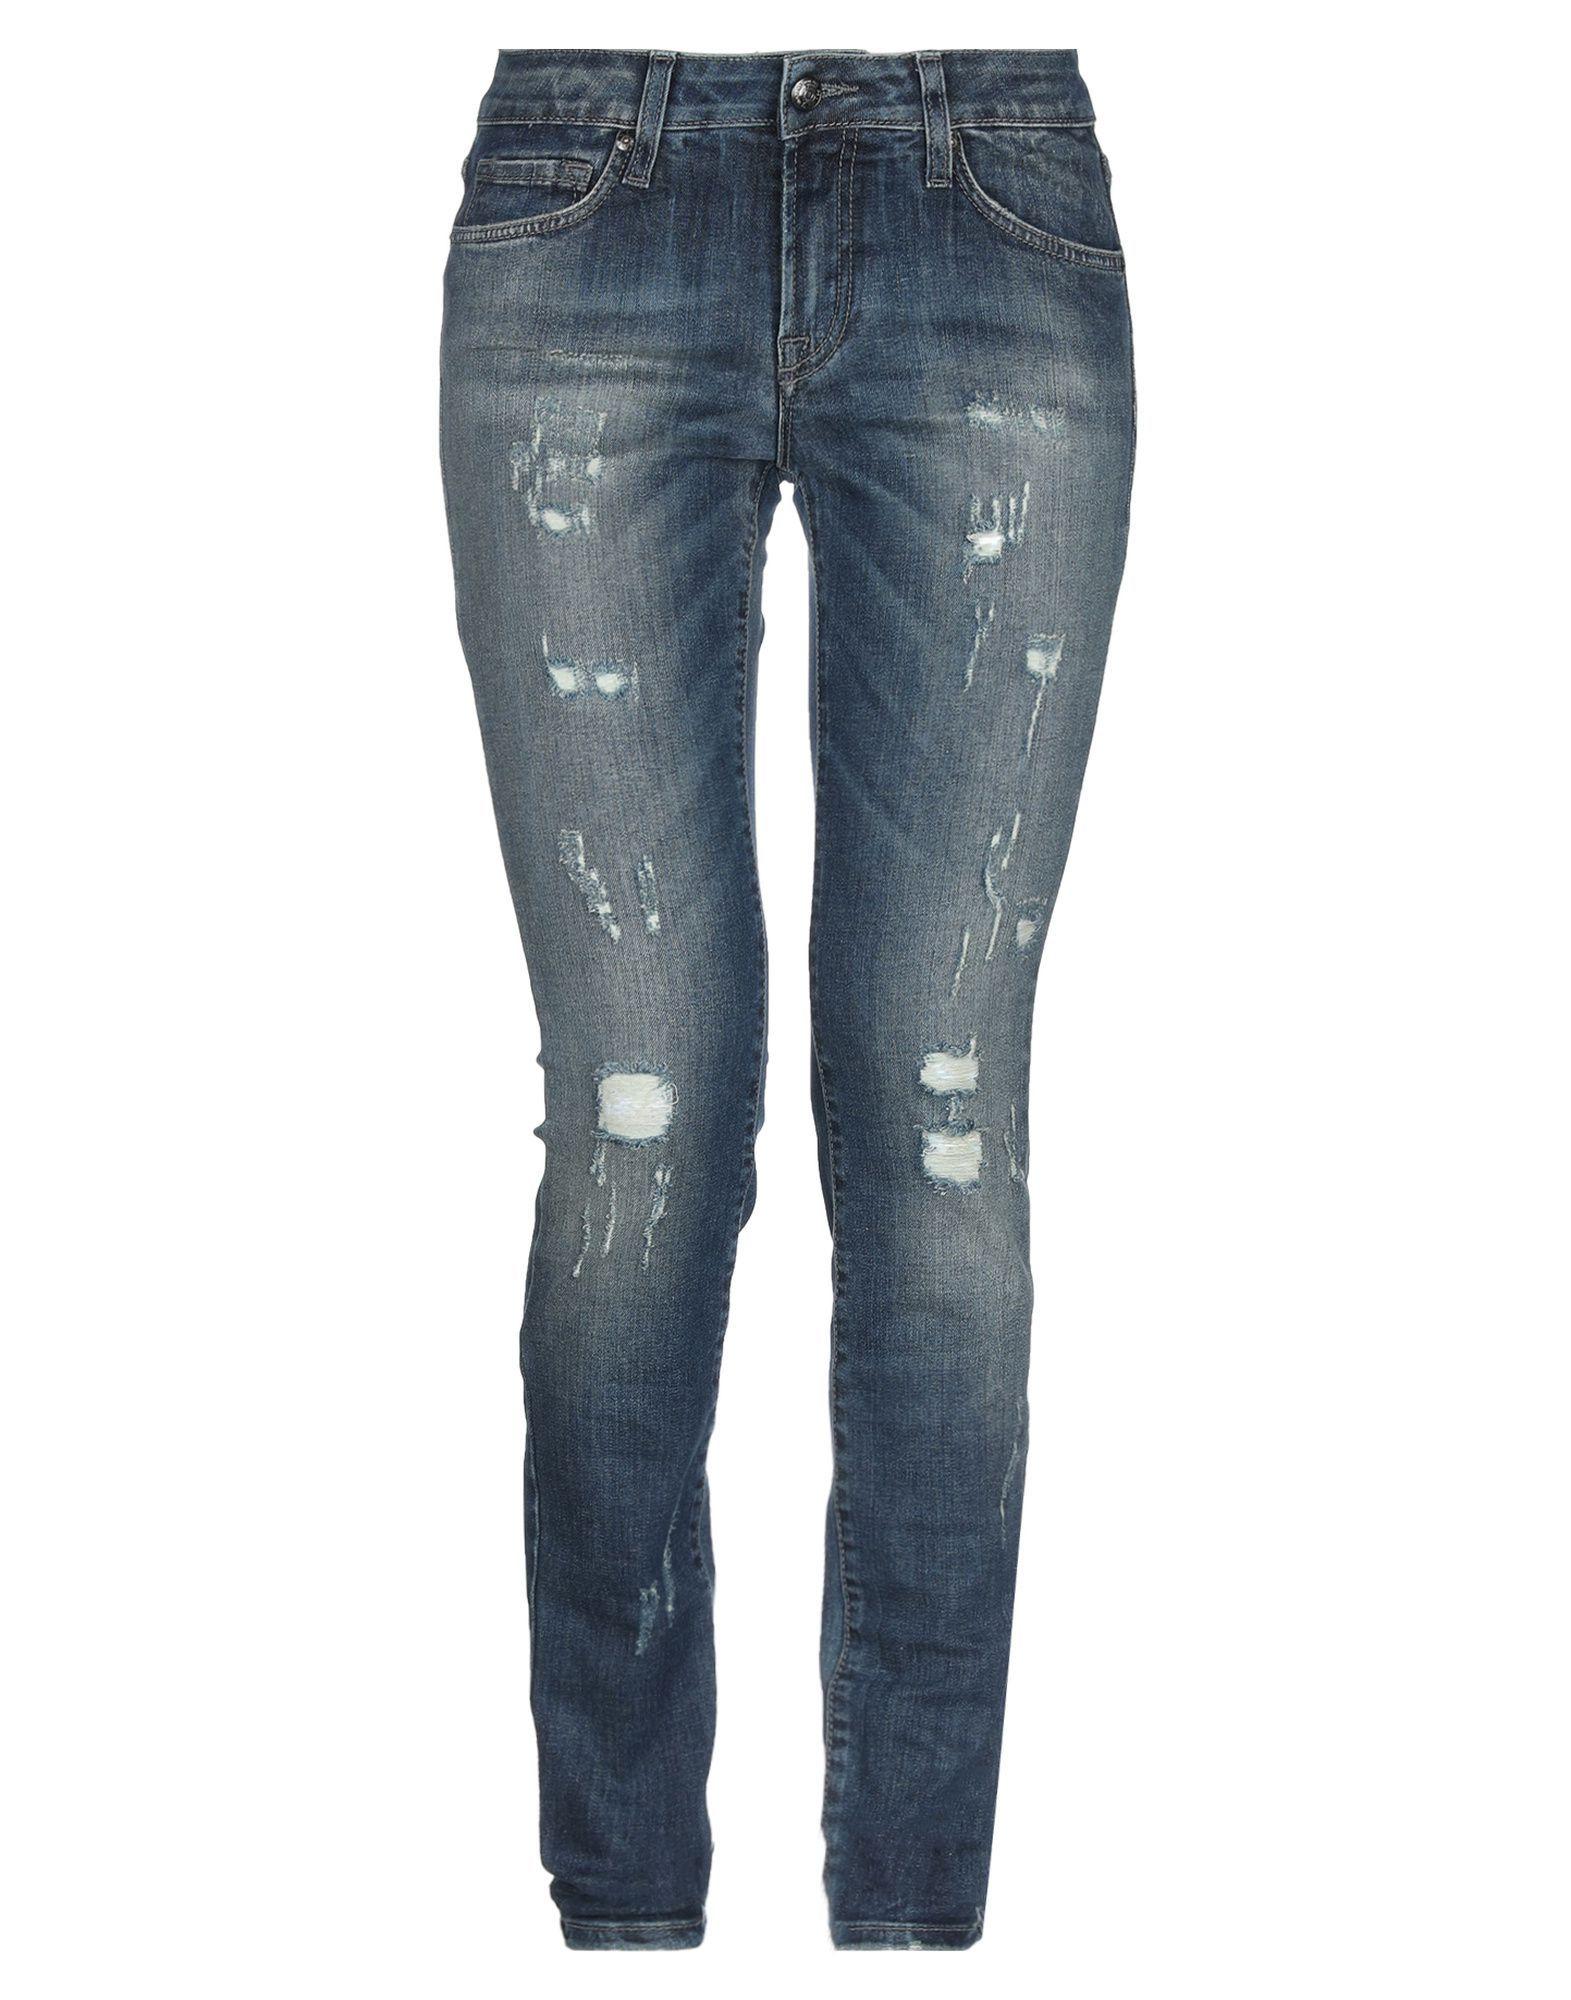 Roÿ Roger's Blue Cotton Slim Fit Jeans